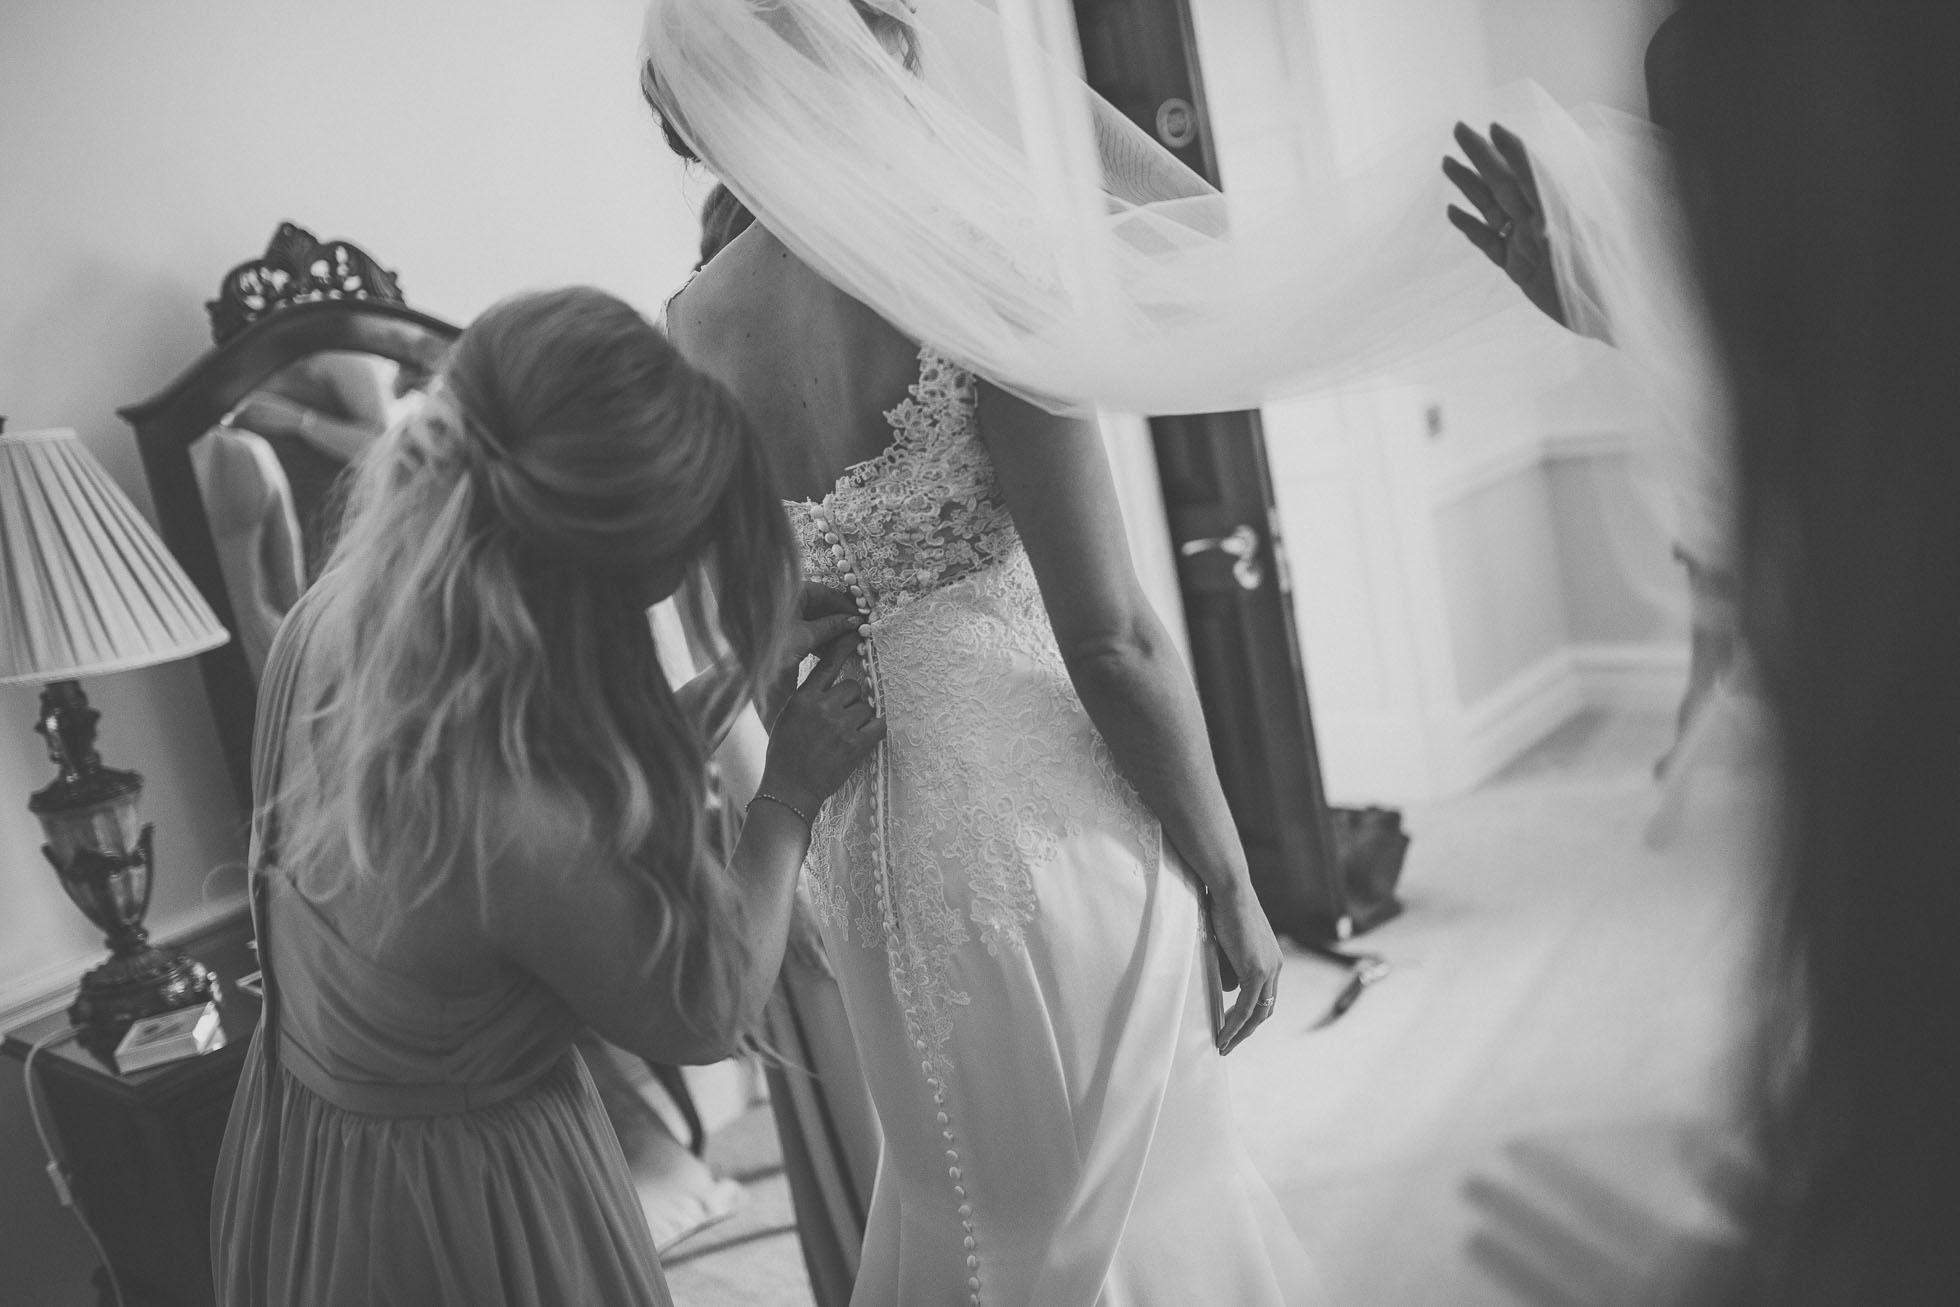 denton-hall-wedding-photographer-21.jpg